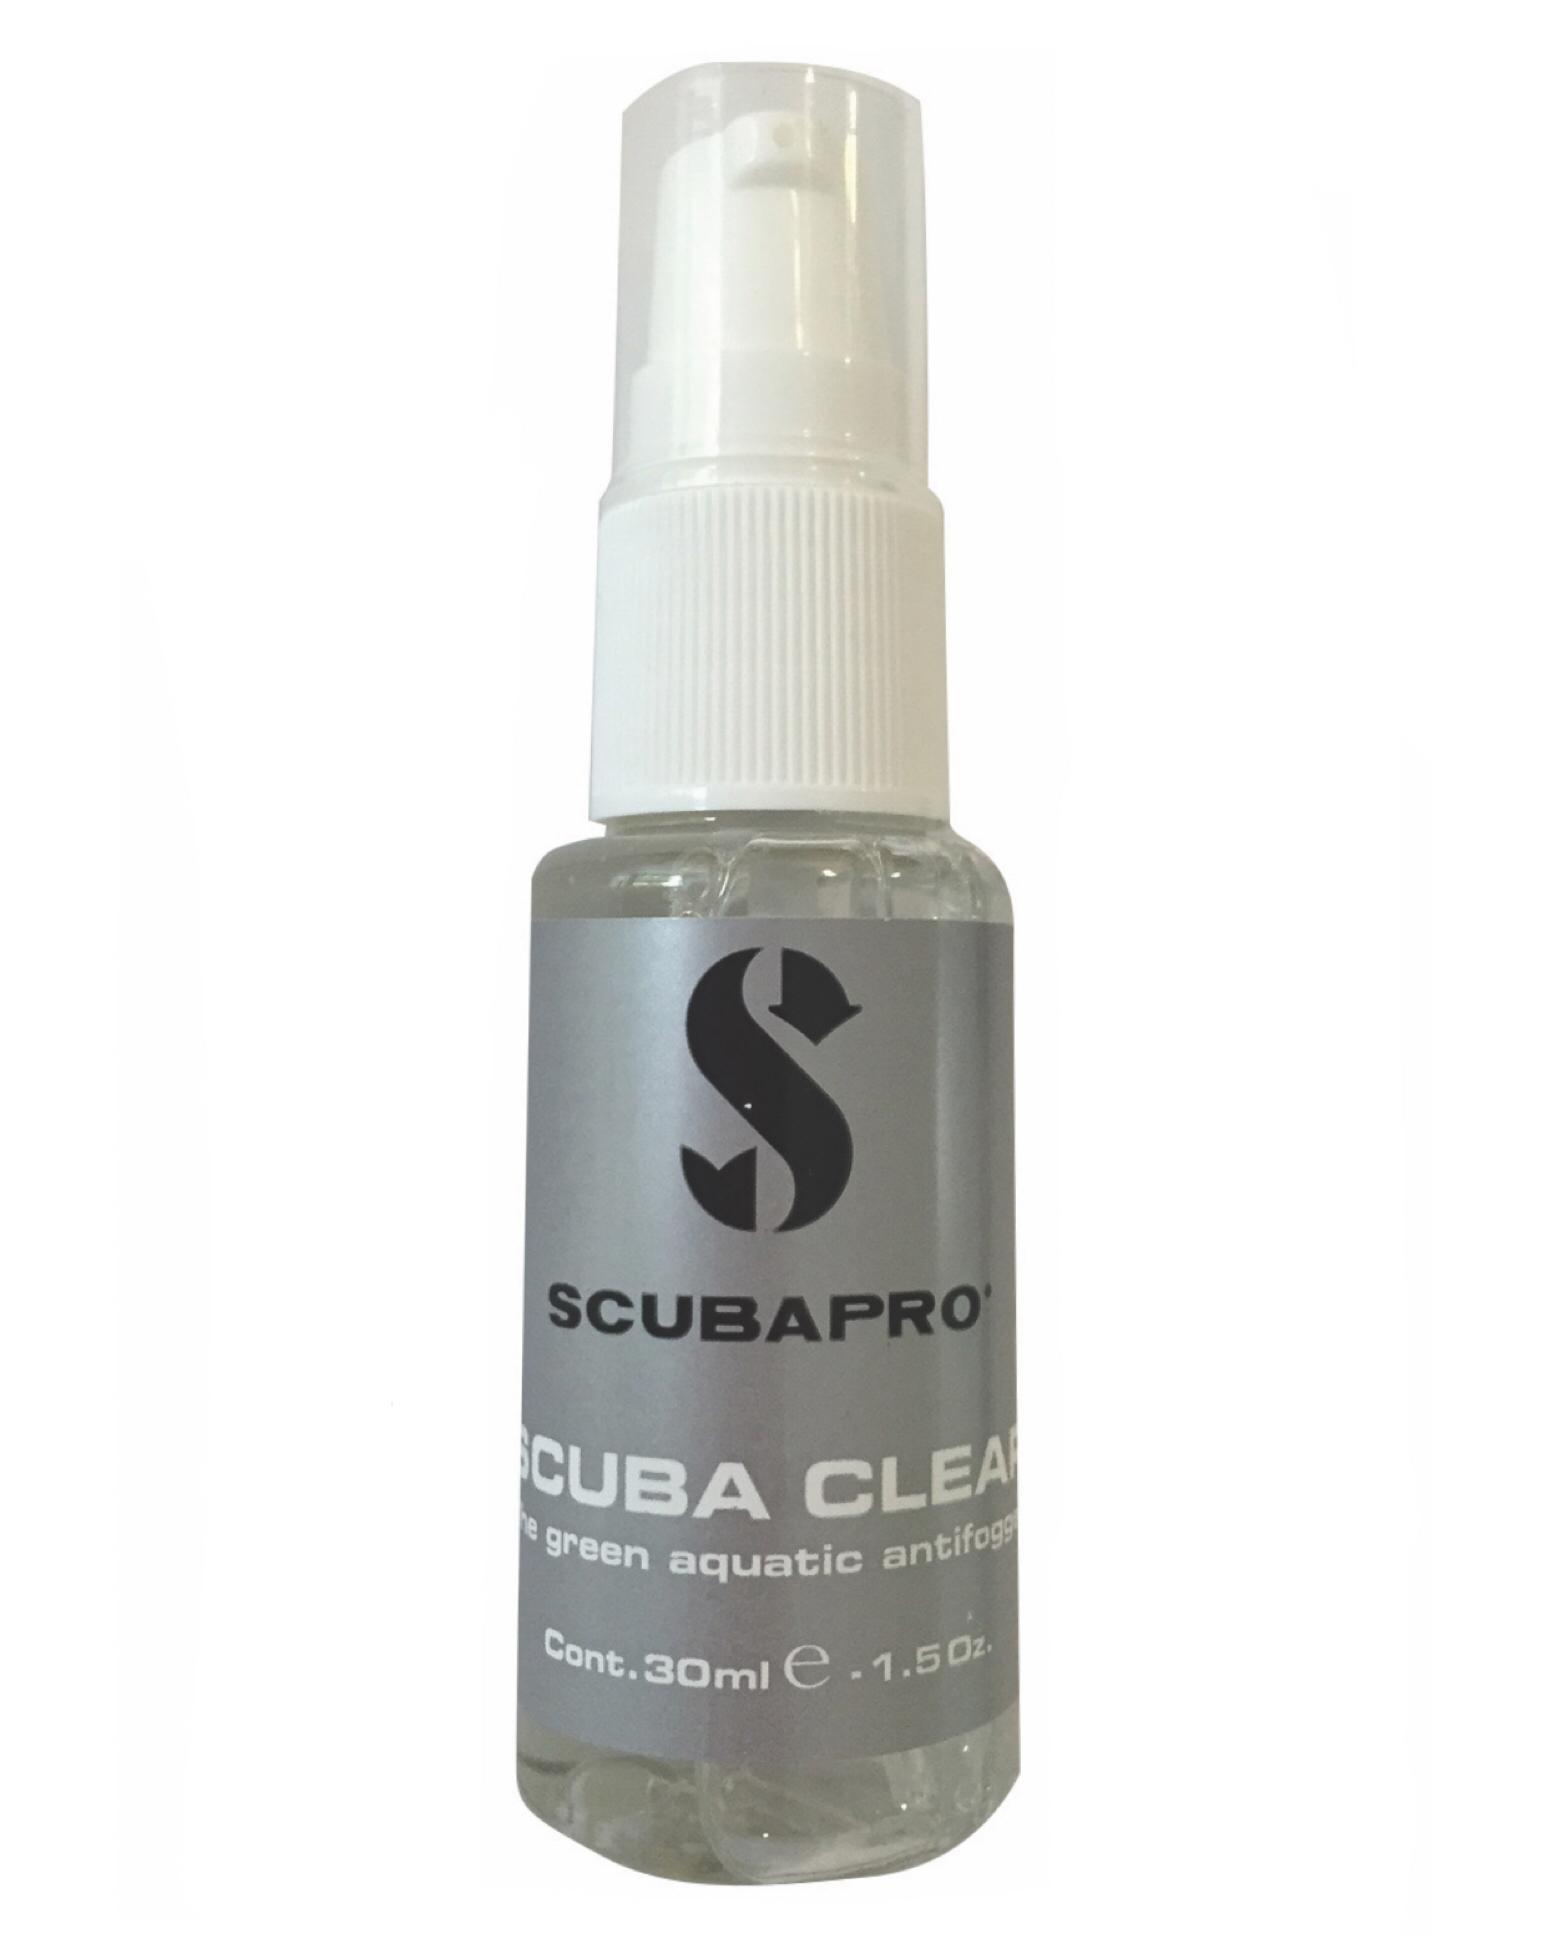 Scubaclear51